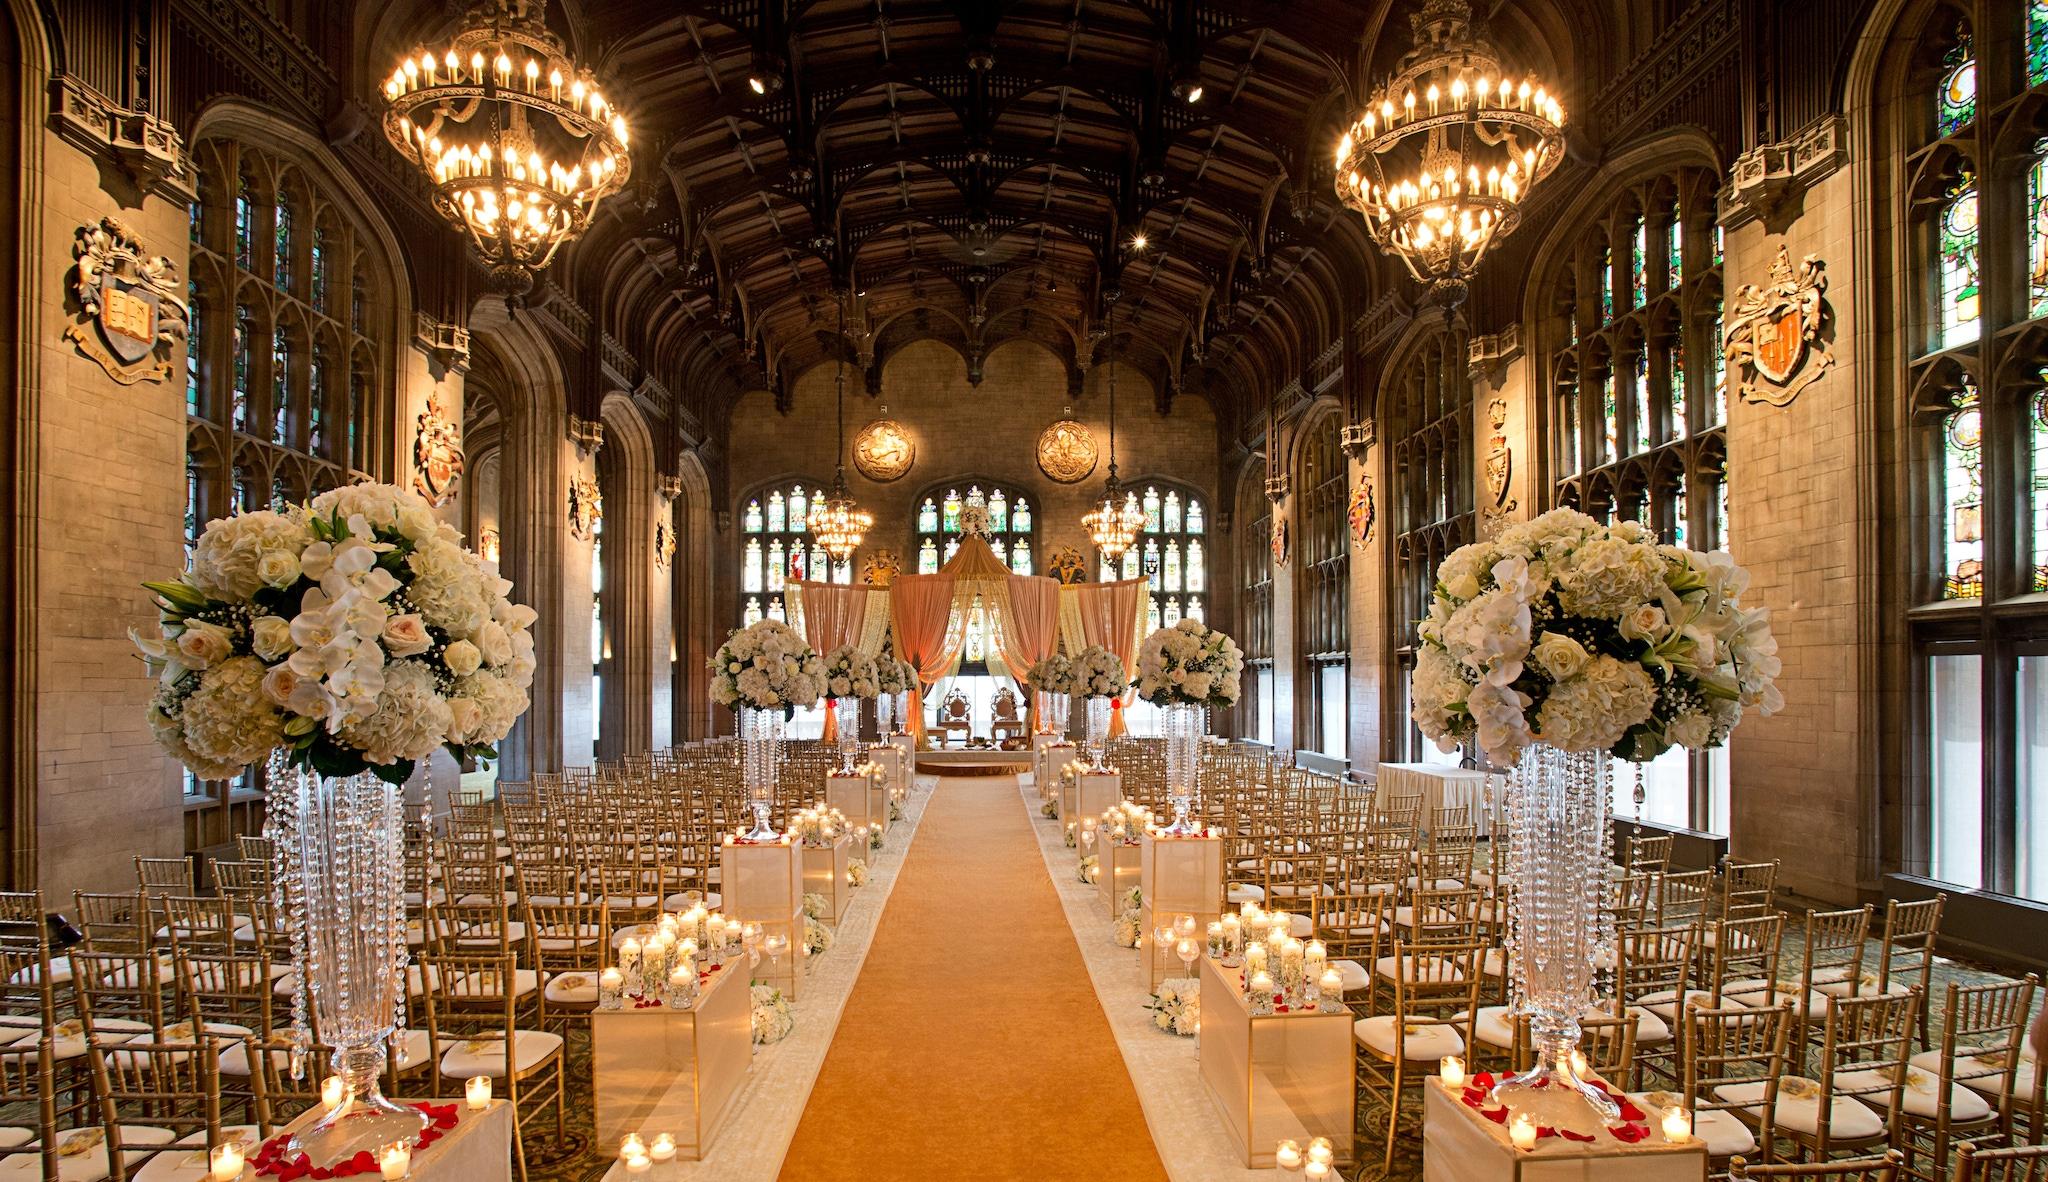 Wedding Aisle Decor.12 Chicago Wedding Aisle Ideas We Adore Partyslate